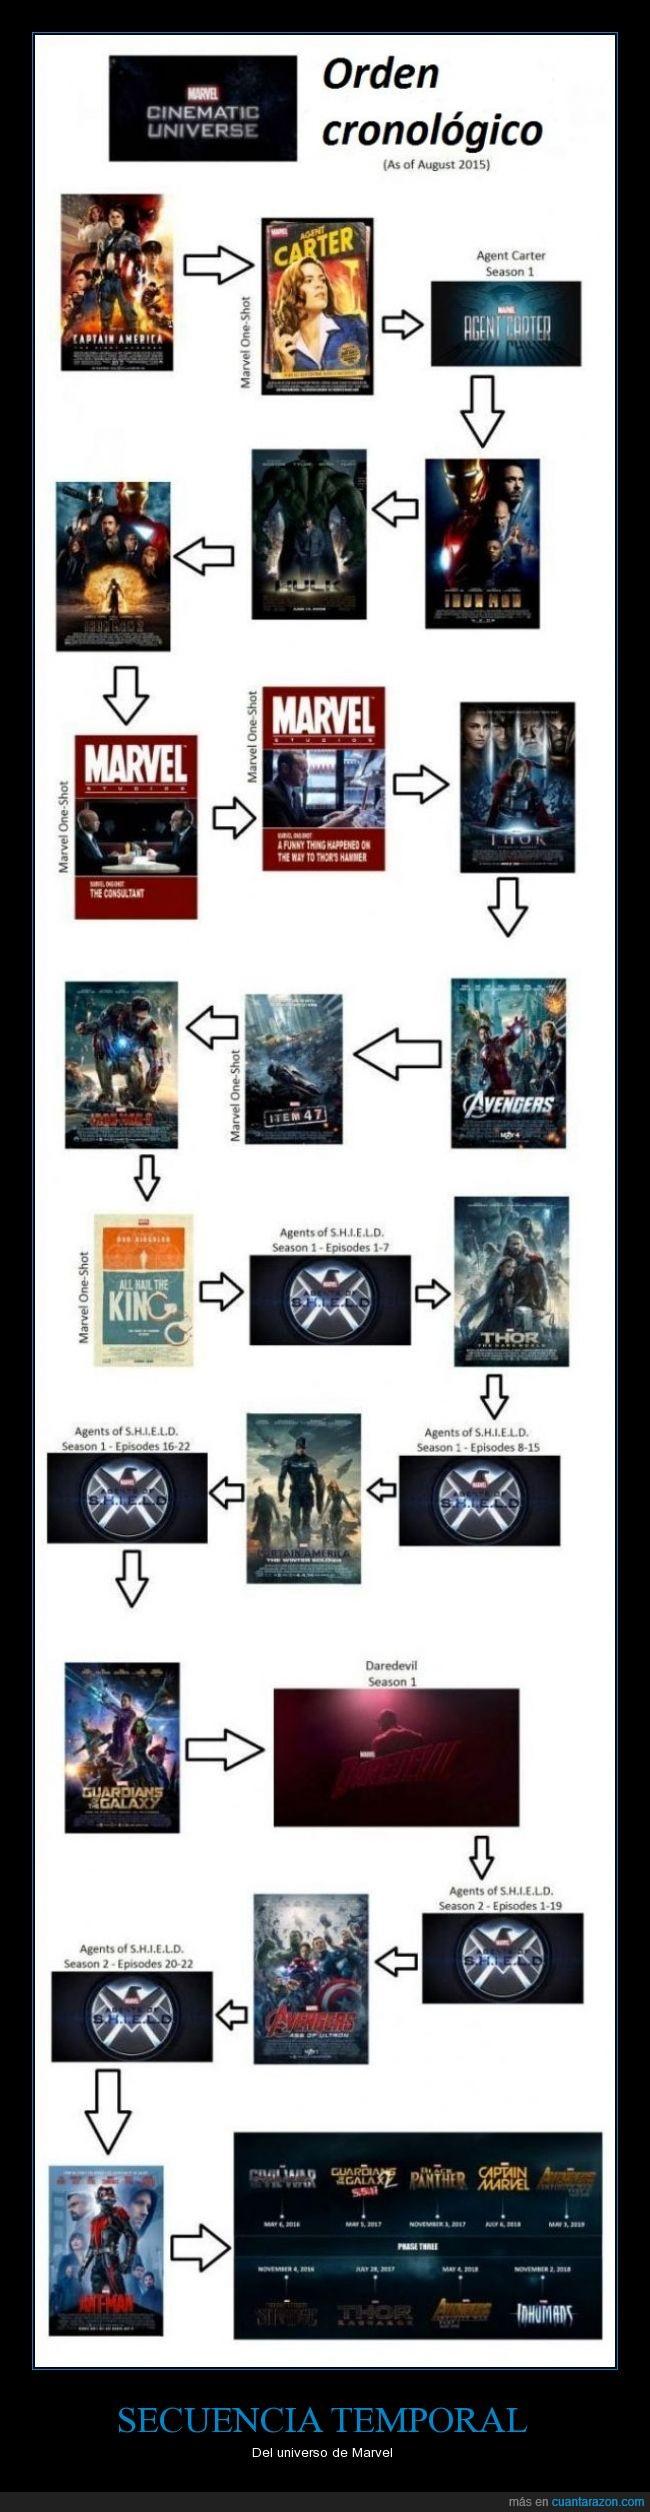 Capitán América,caricatura,cómic,dibujos,historieta,Hulk,Marvel,película,saga,sin Spiderman